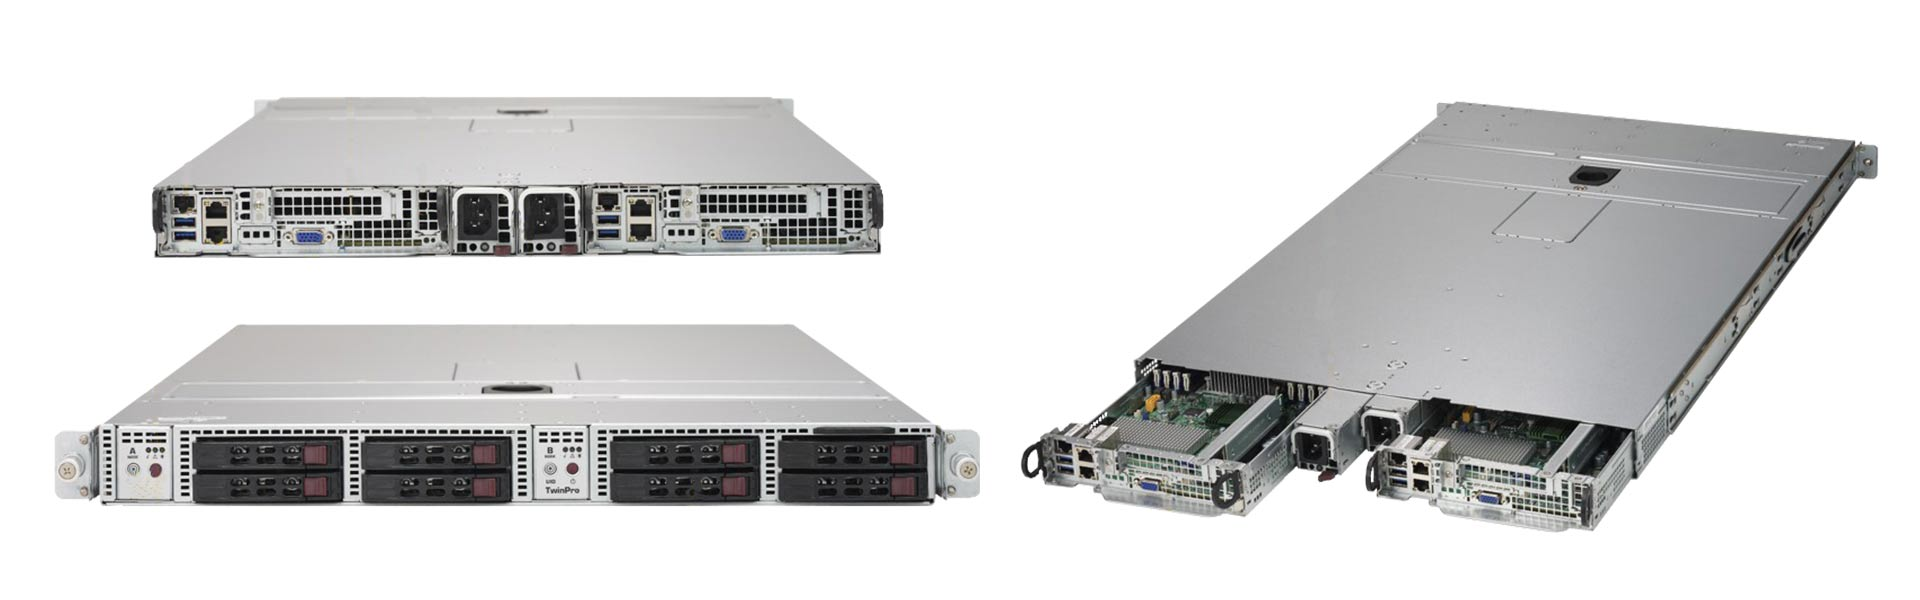 Servers & Appliances - vSWITCH